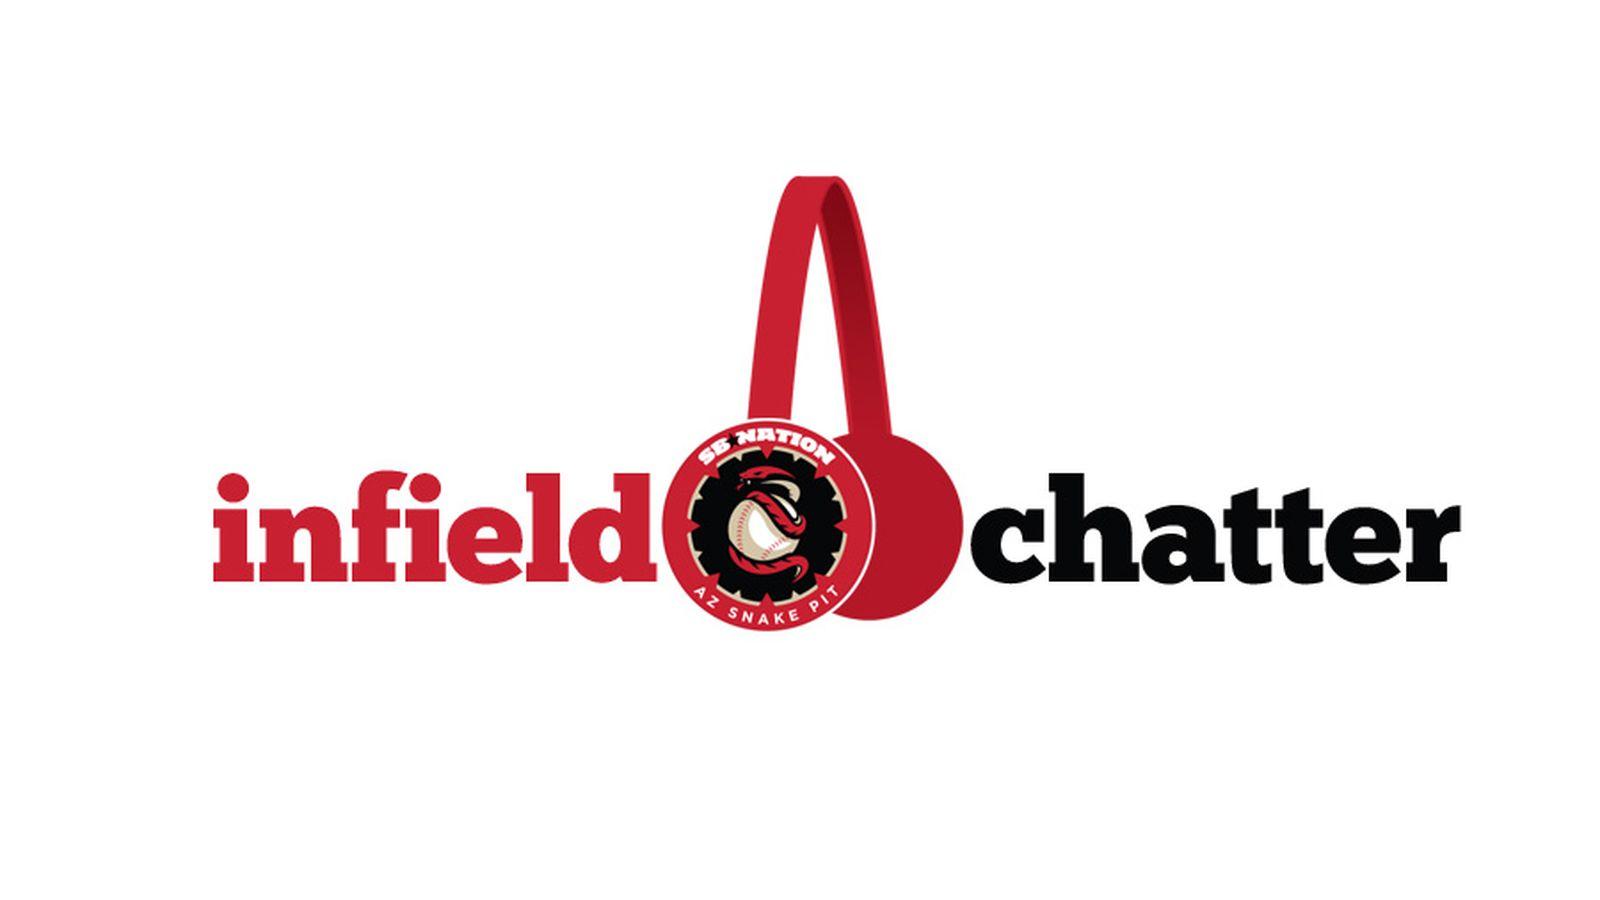 Infield-chatter-logo.0.0